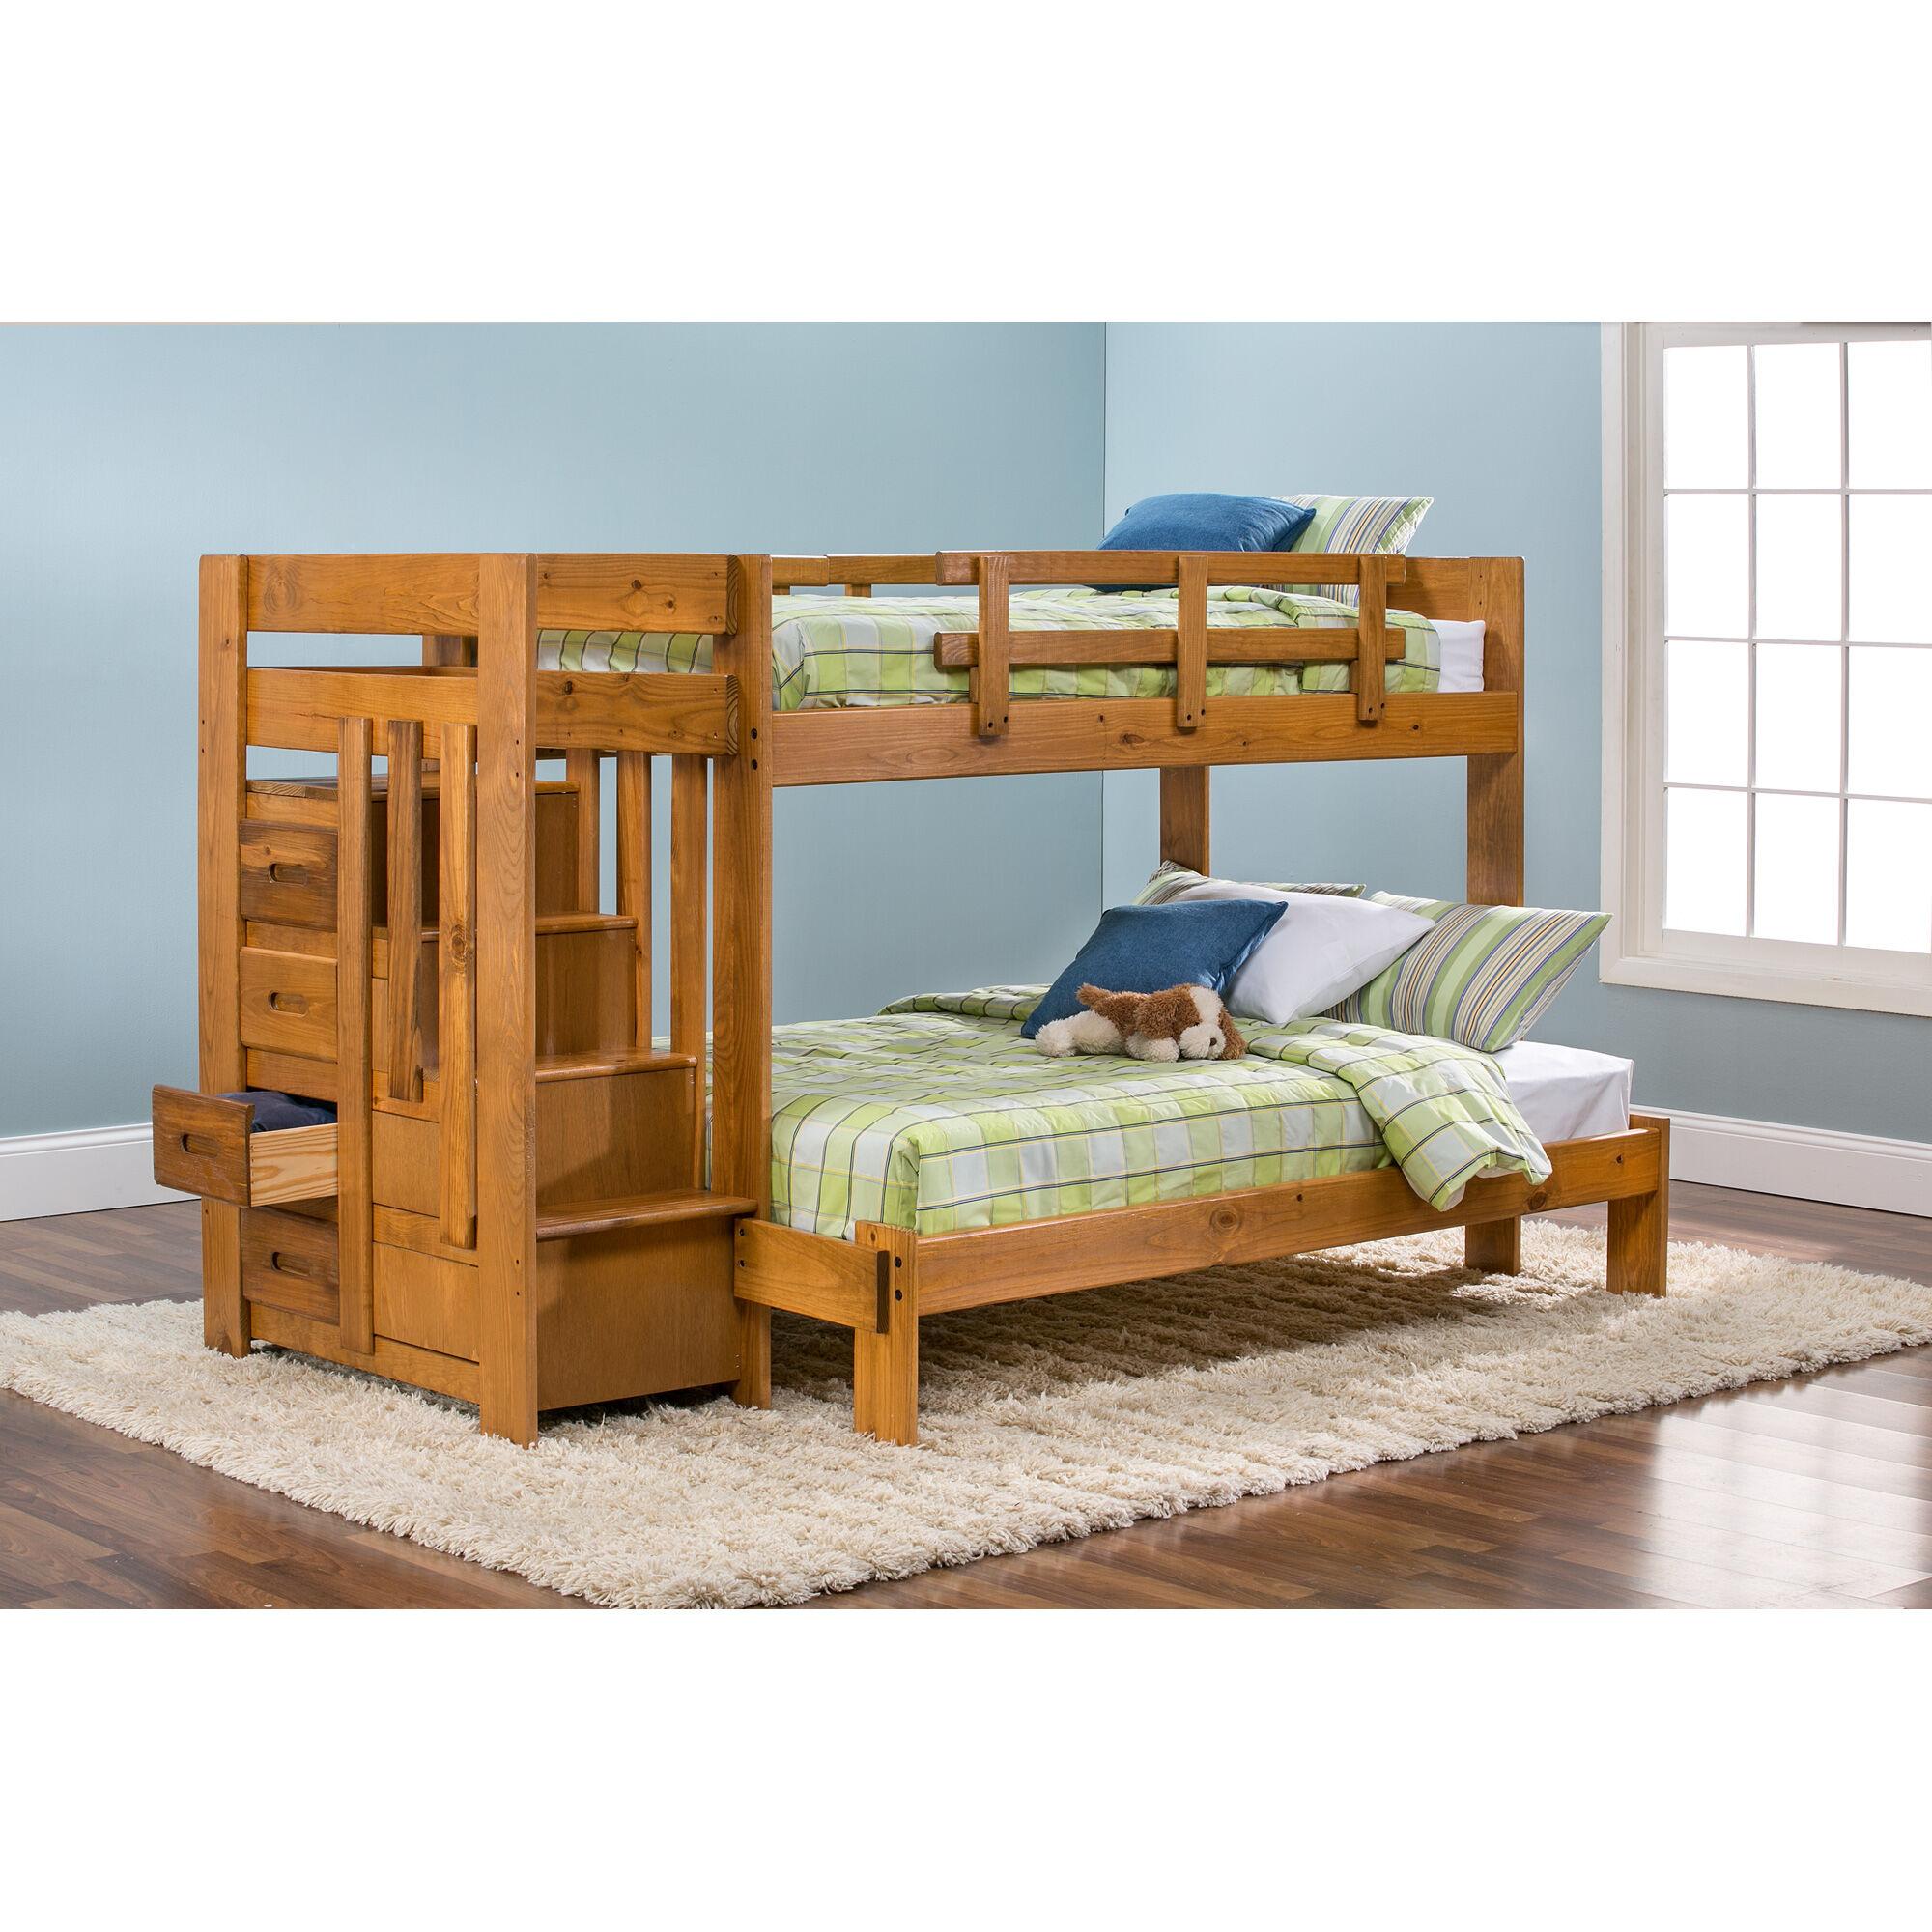 Slumberland Furniture Tanglewood Honey TWFL Stair Bunk